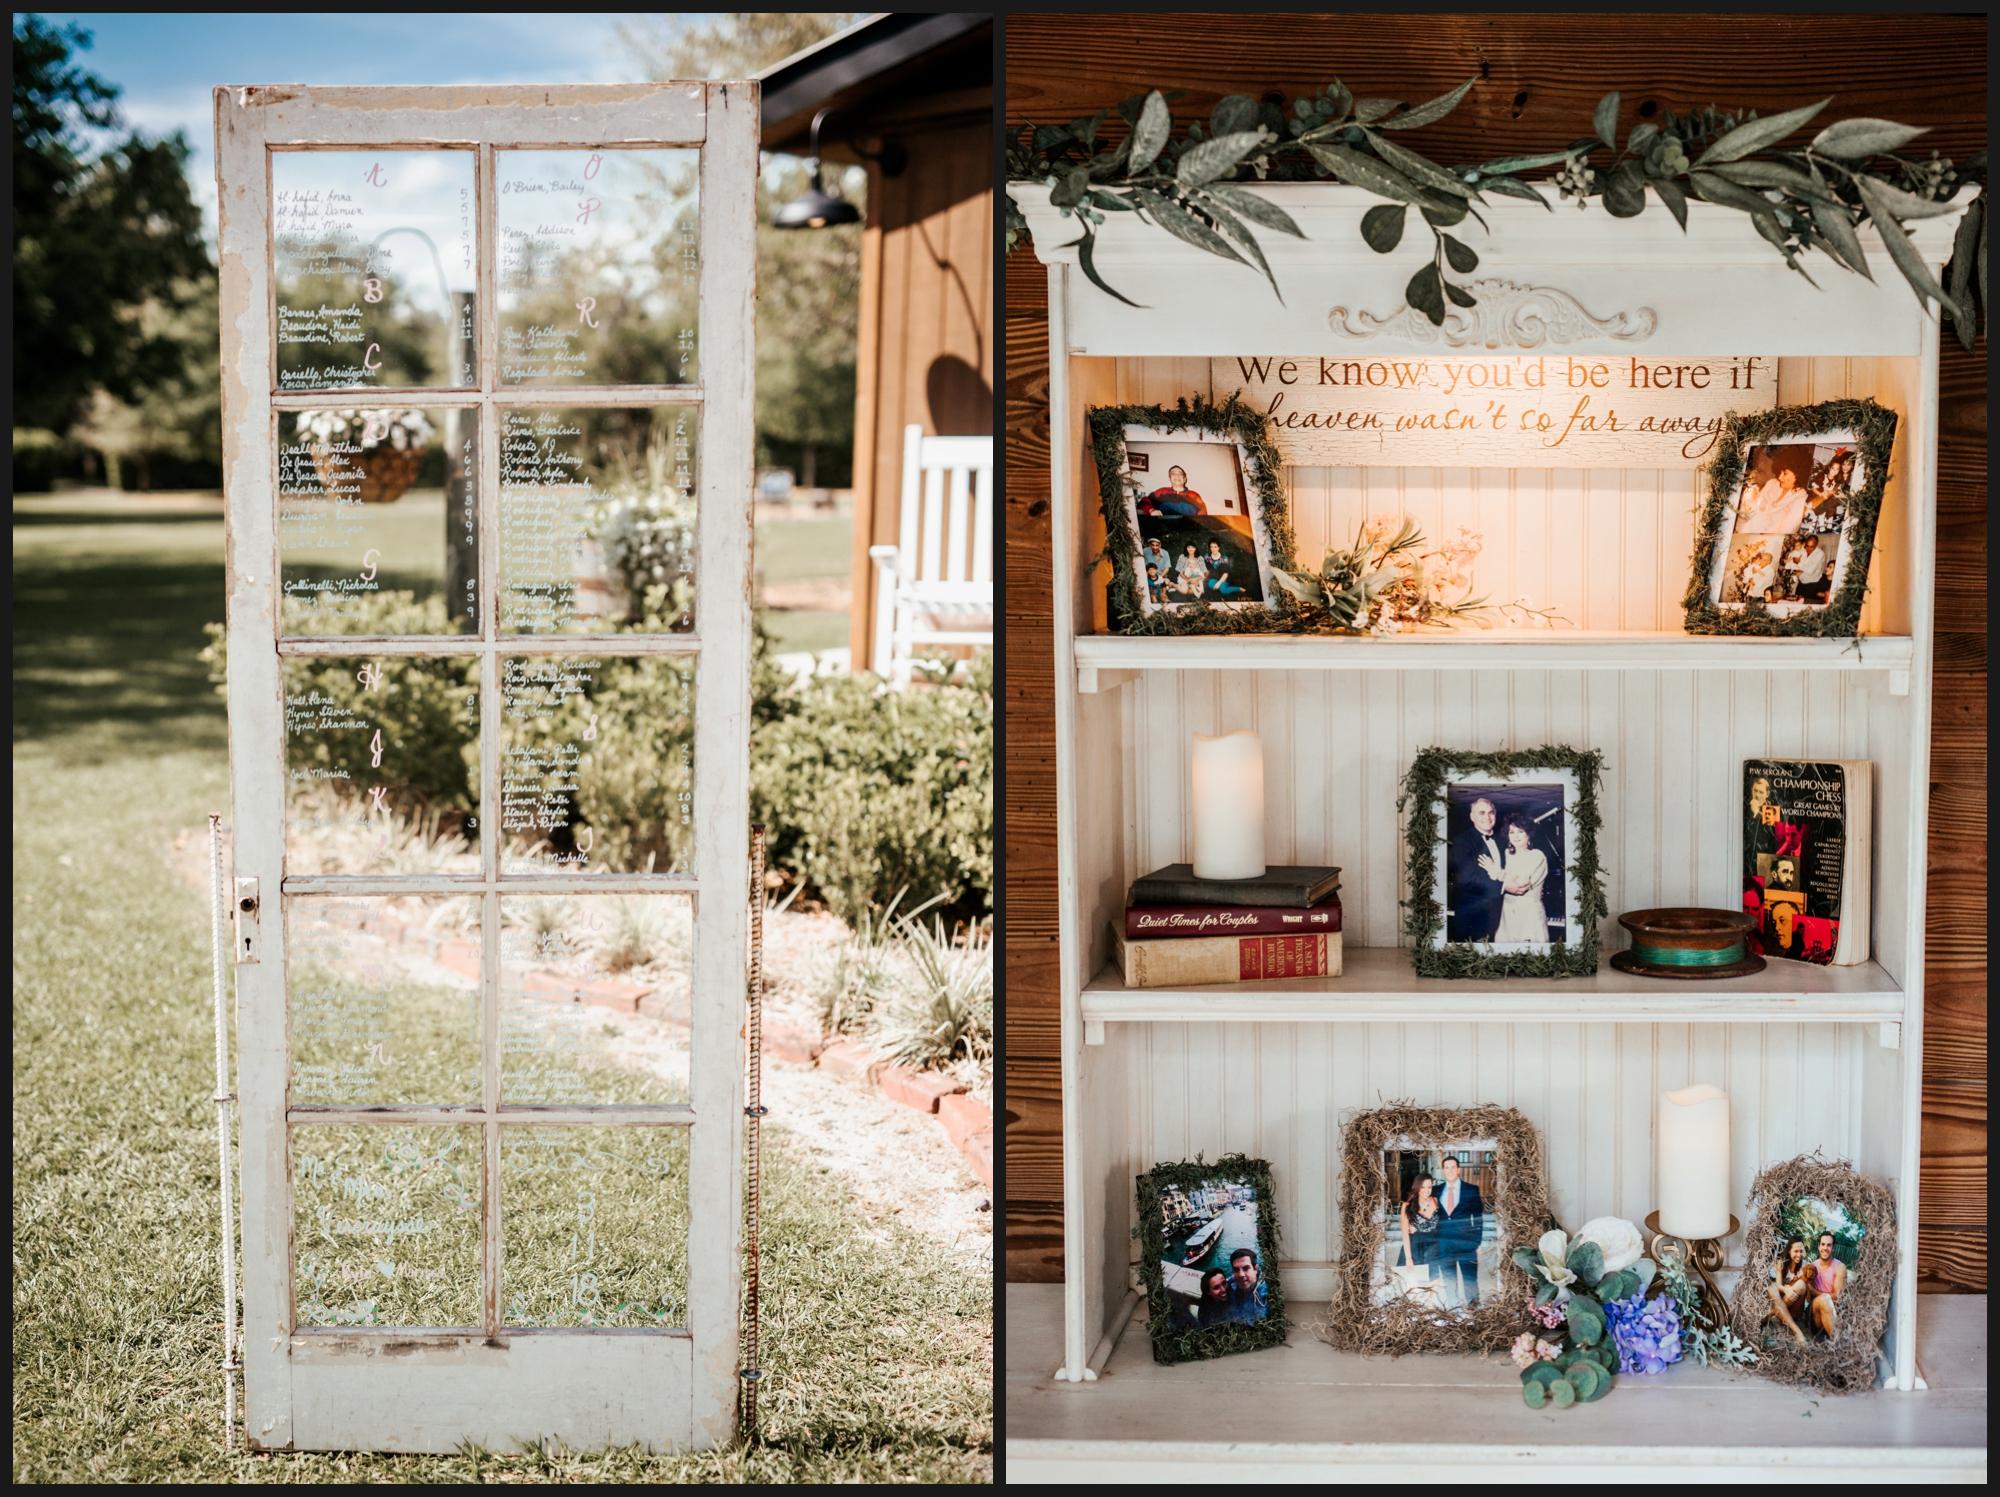 Orlando-Wedding-Photographer-destination-wedding-photographer-florida-wedding-photographer-bohemian-wedding-photographer_1566.jpg